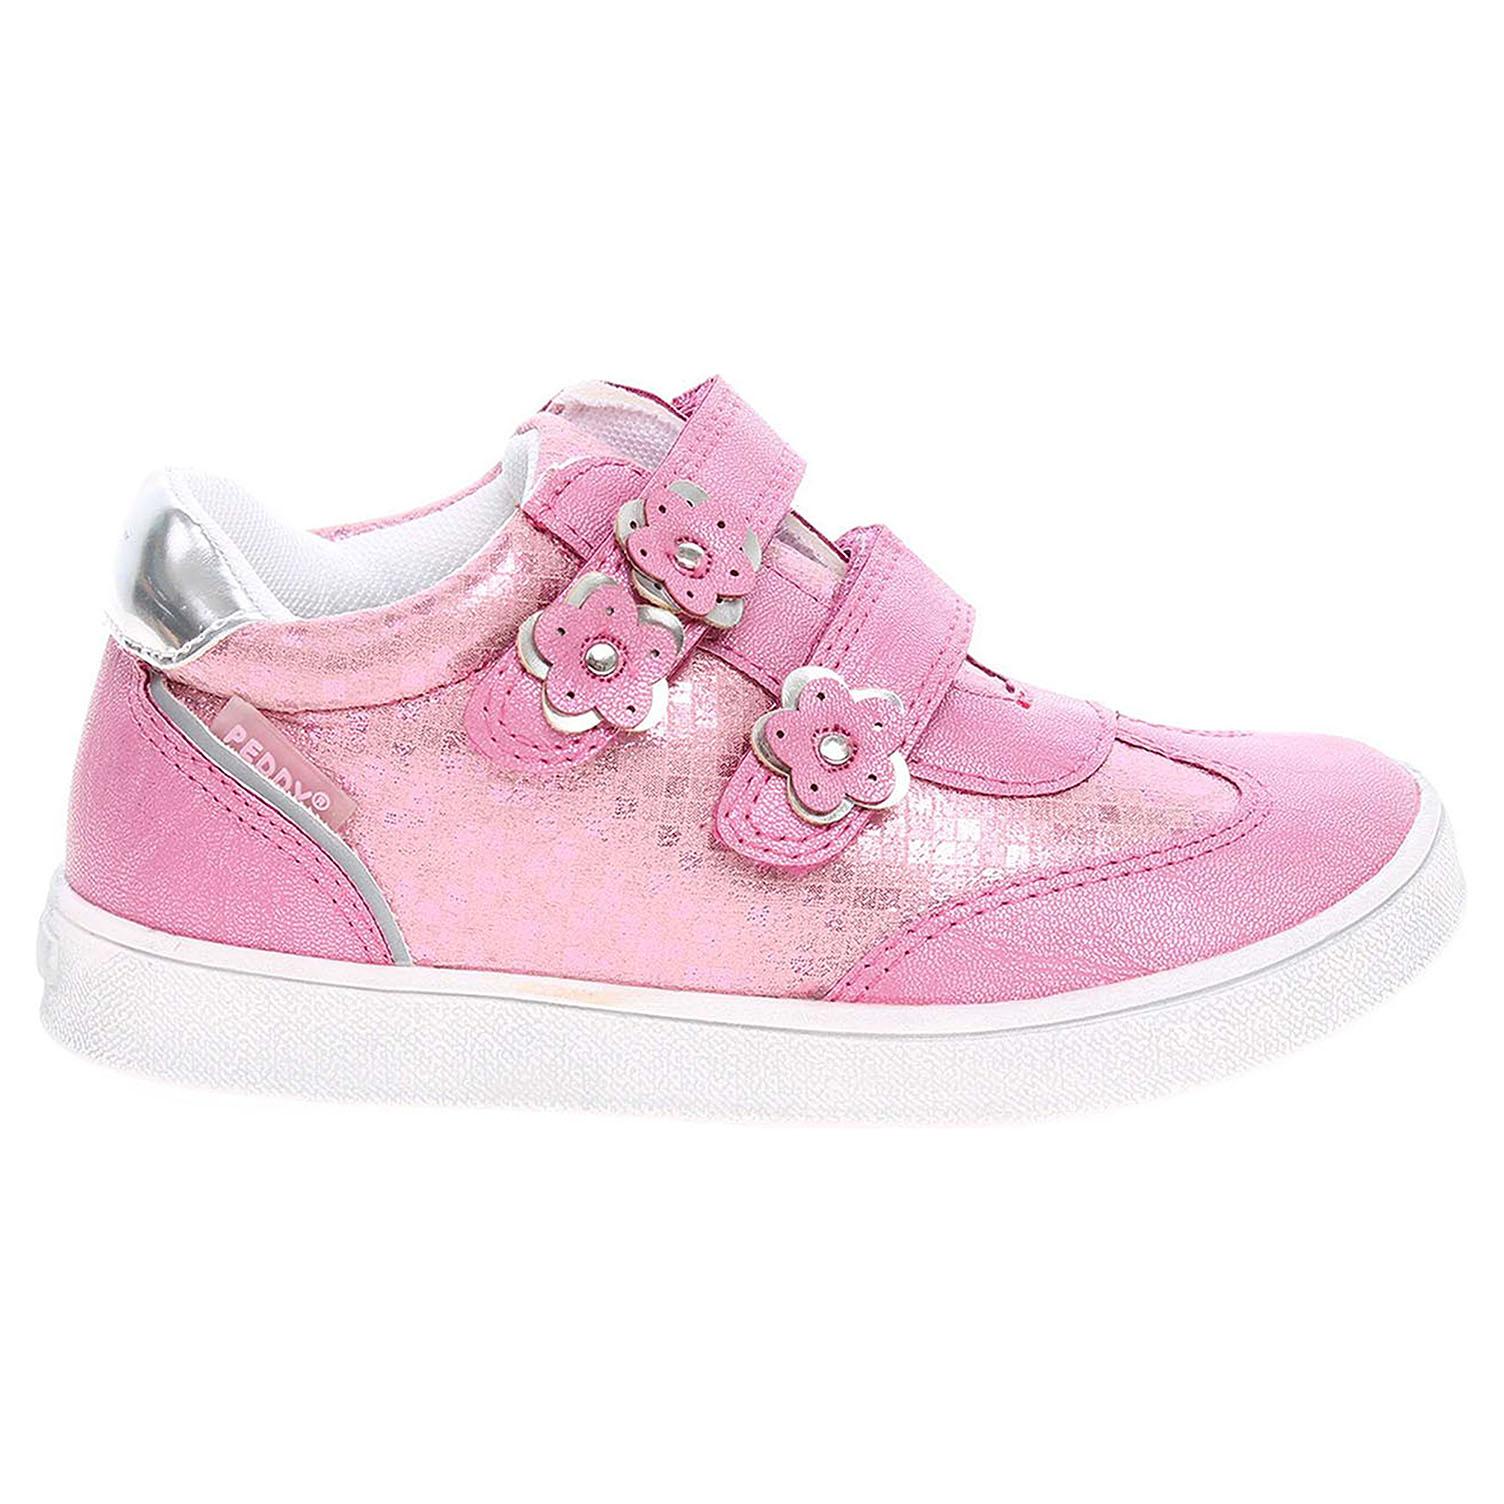 Pedy dívčí obuv PY-618-35-12 růžová 23